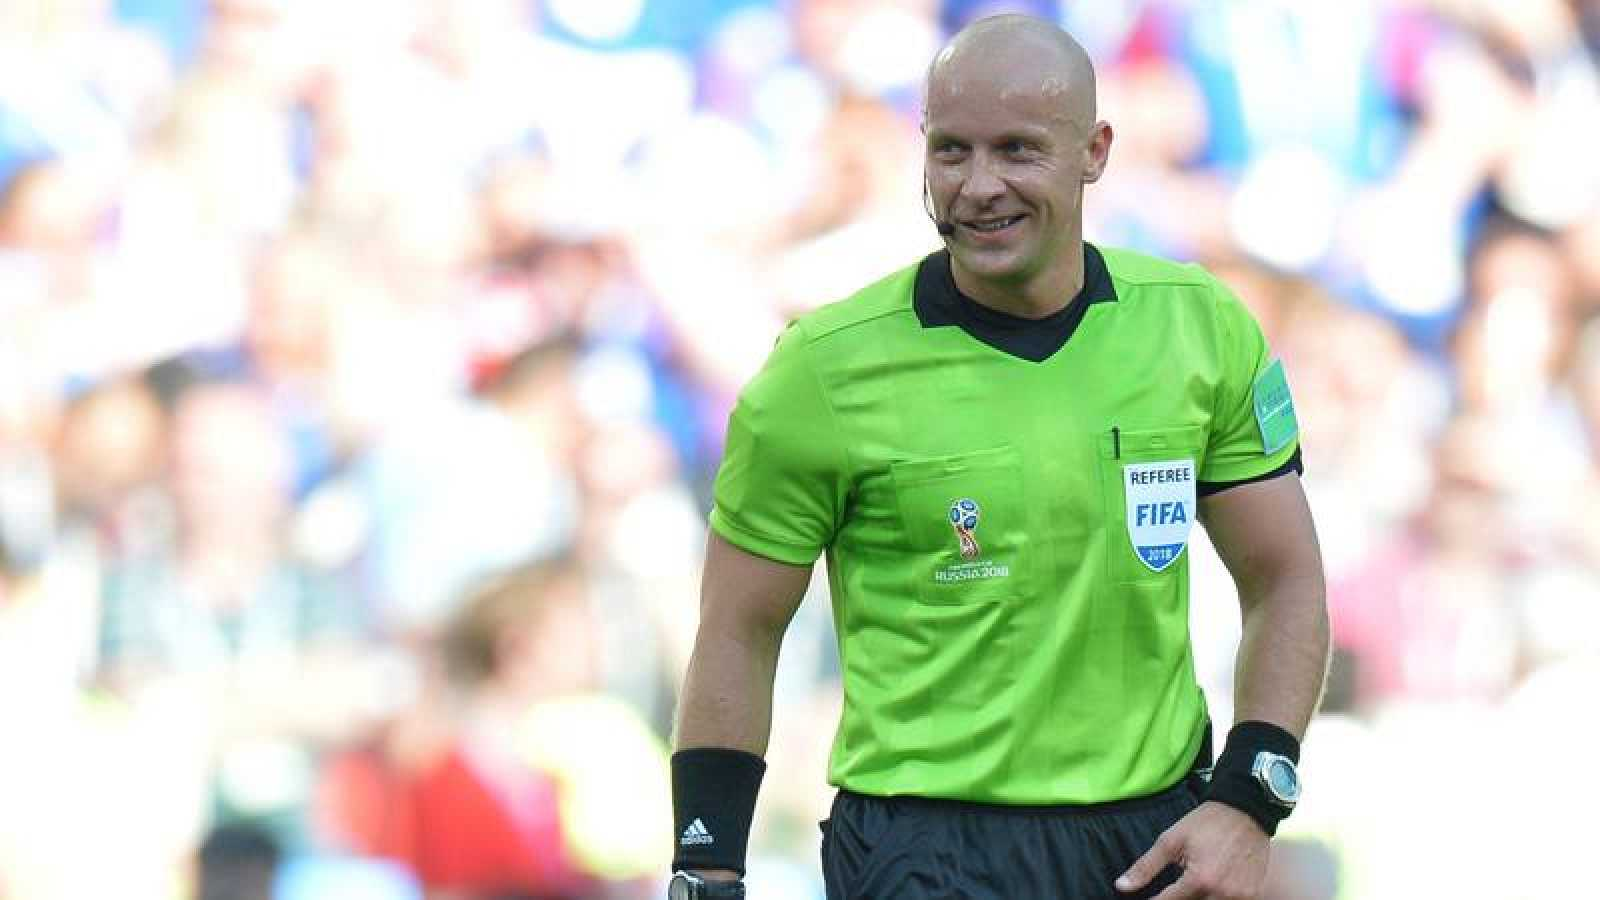 Szymon Marciniak durante el partido del Mundial de Rusia 2018 entre Argentina e Islandia.